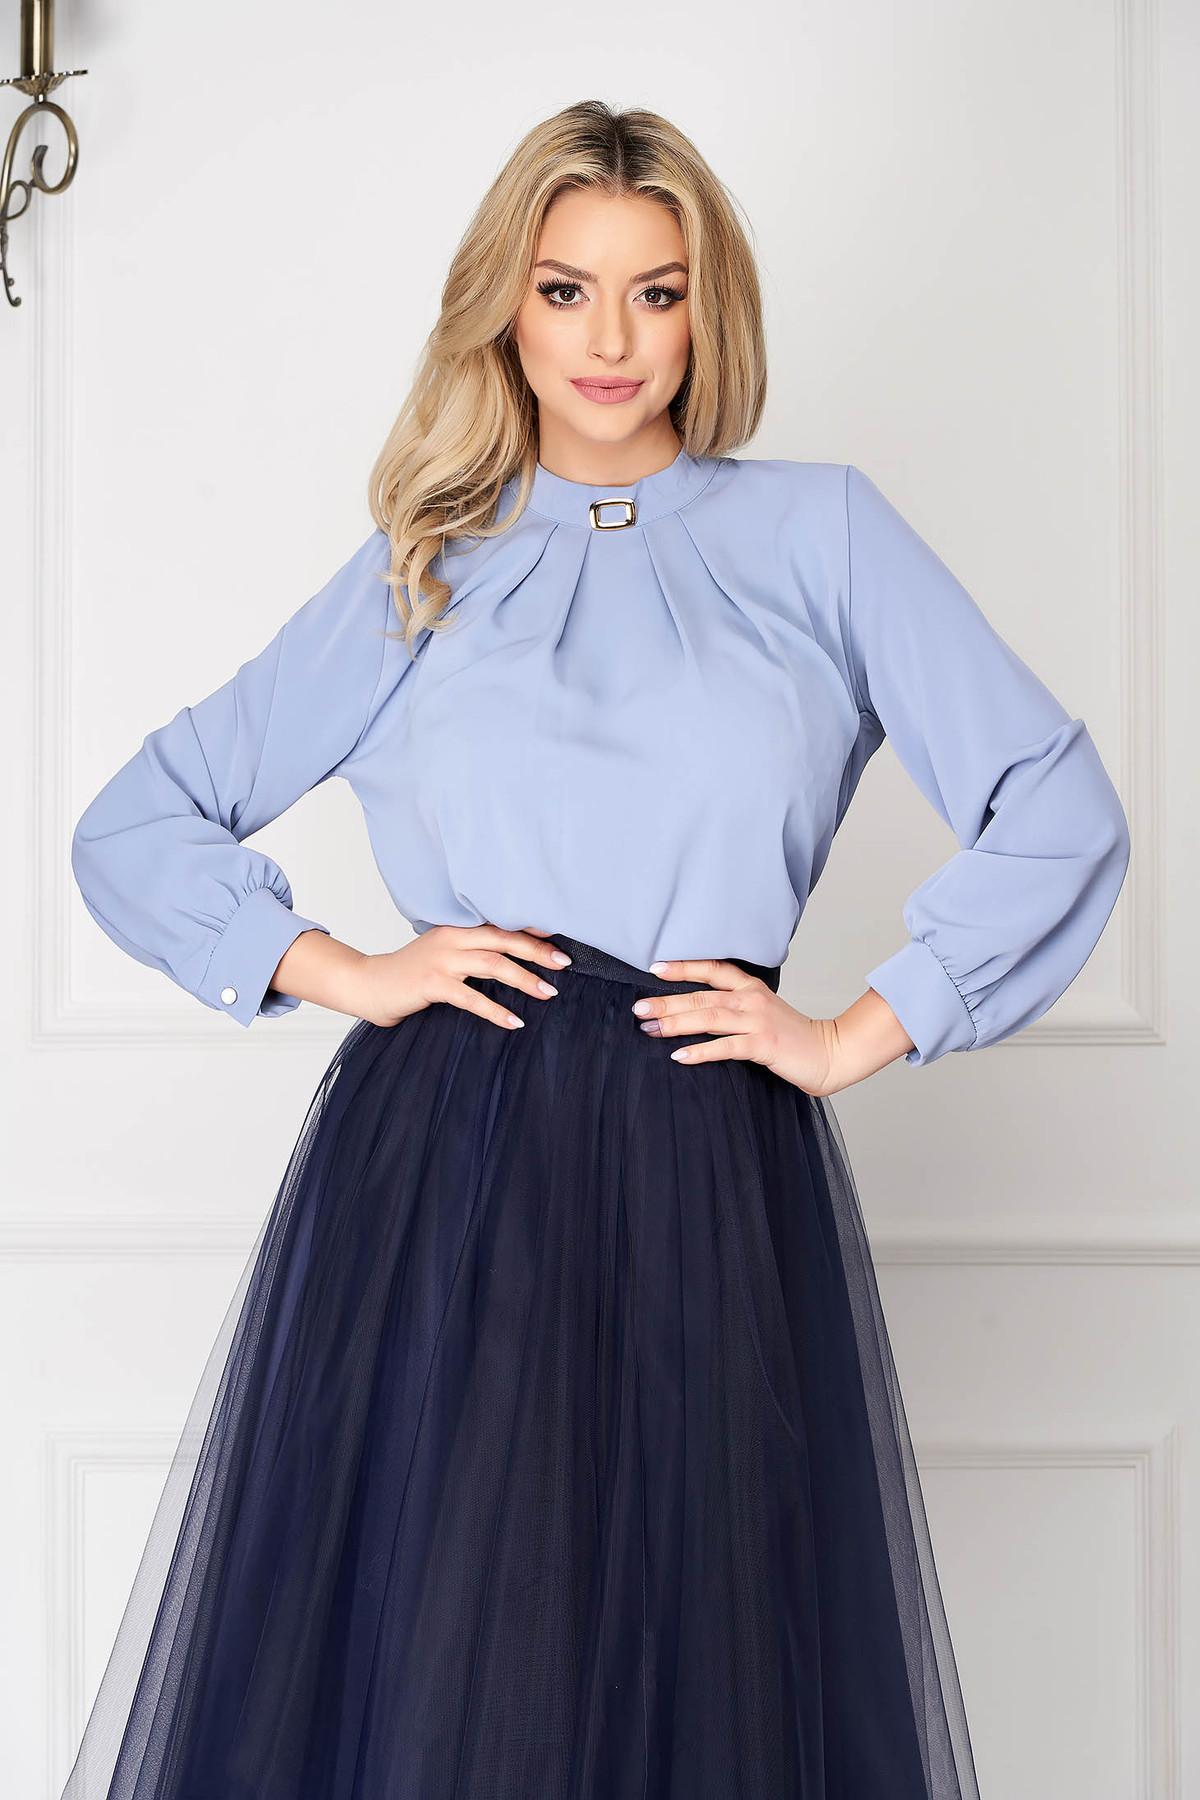 Bluza dama SunShine albastra office cu croi larg scurta din voal cu accesoriu metalic